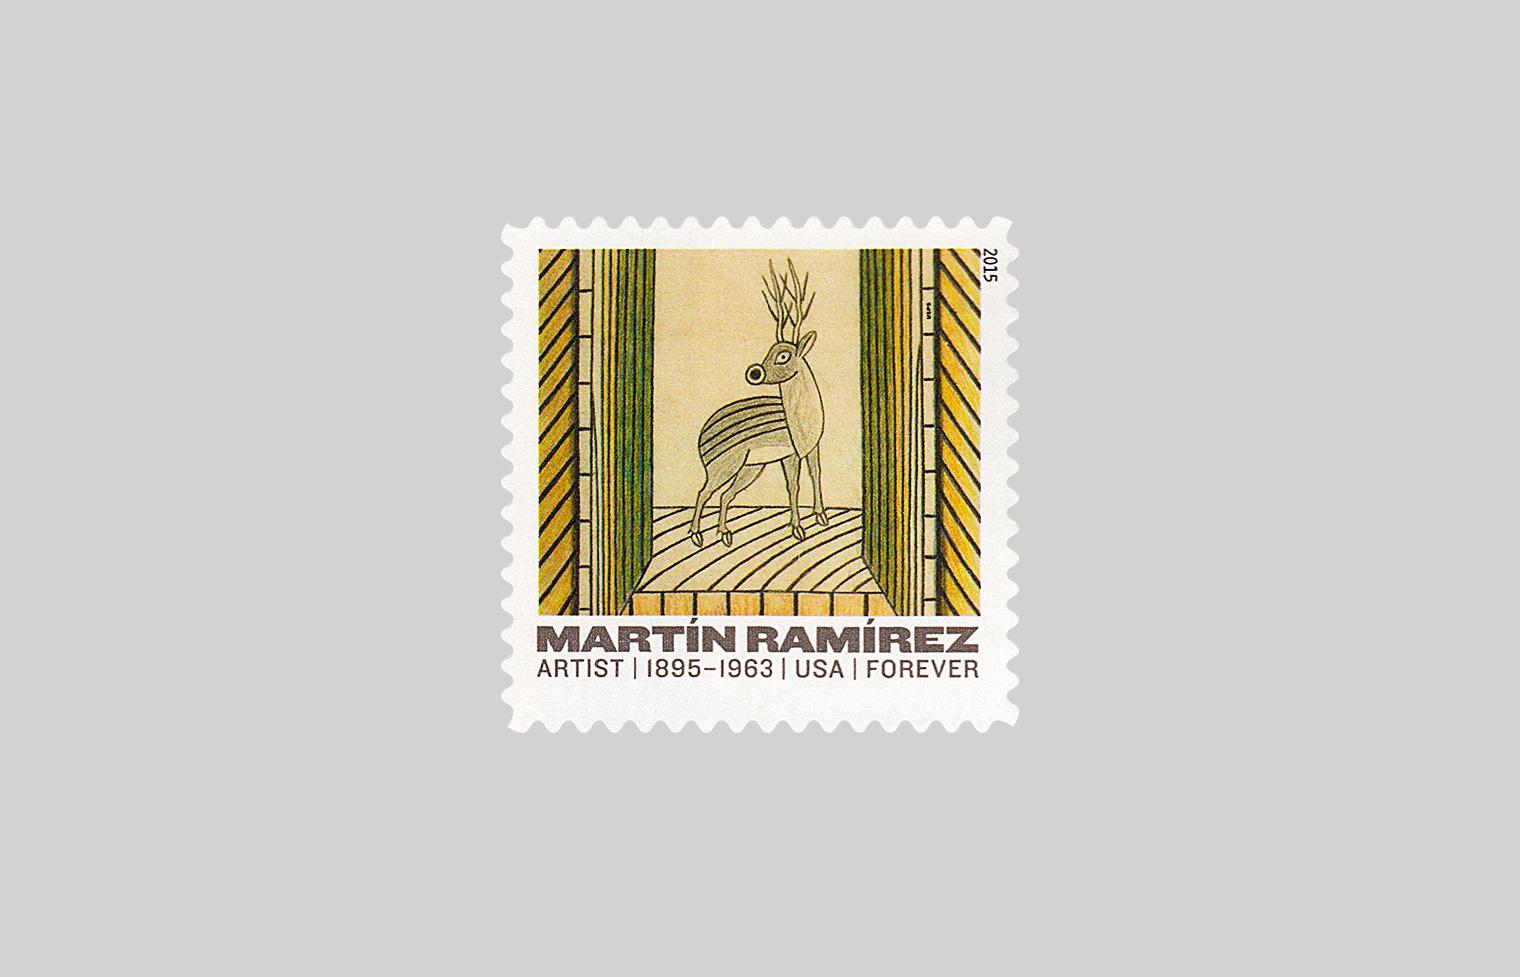 Martin Ramirez Stamps